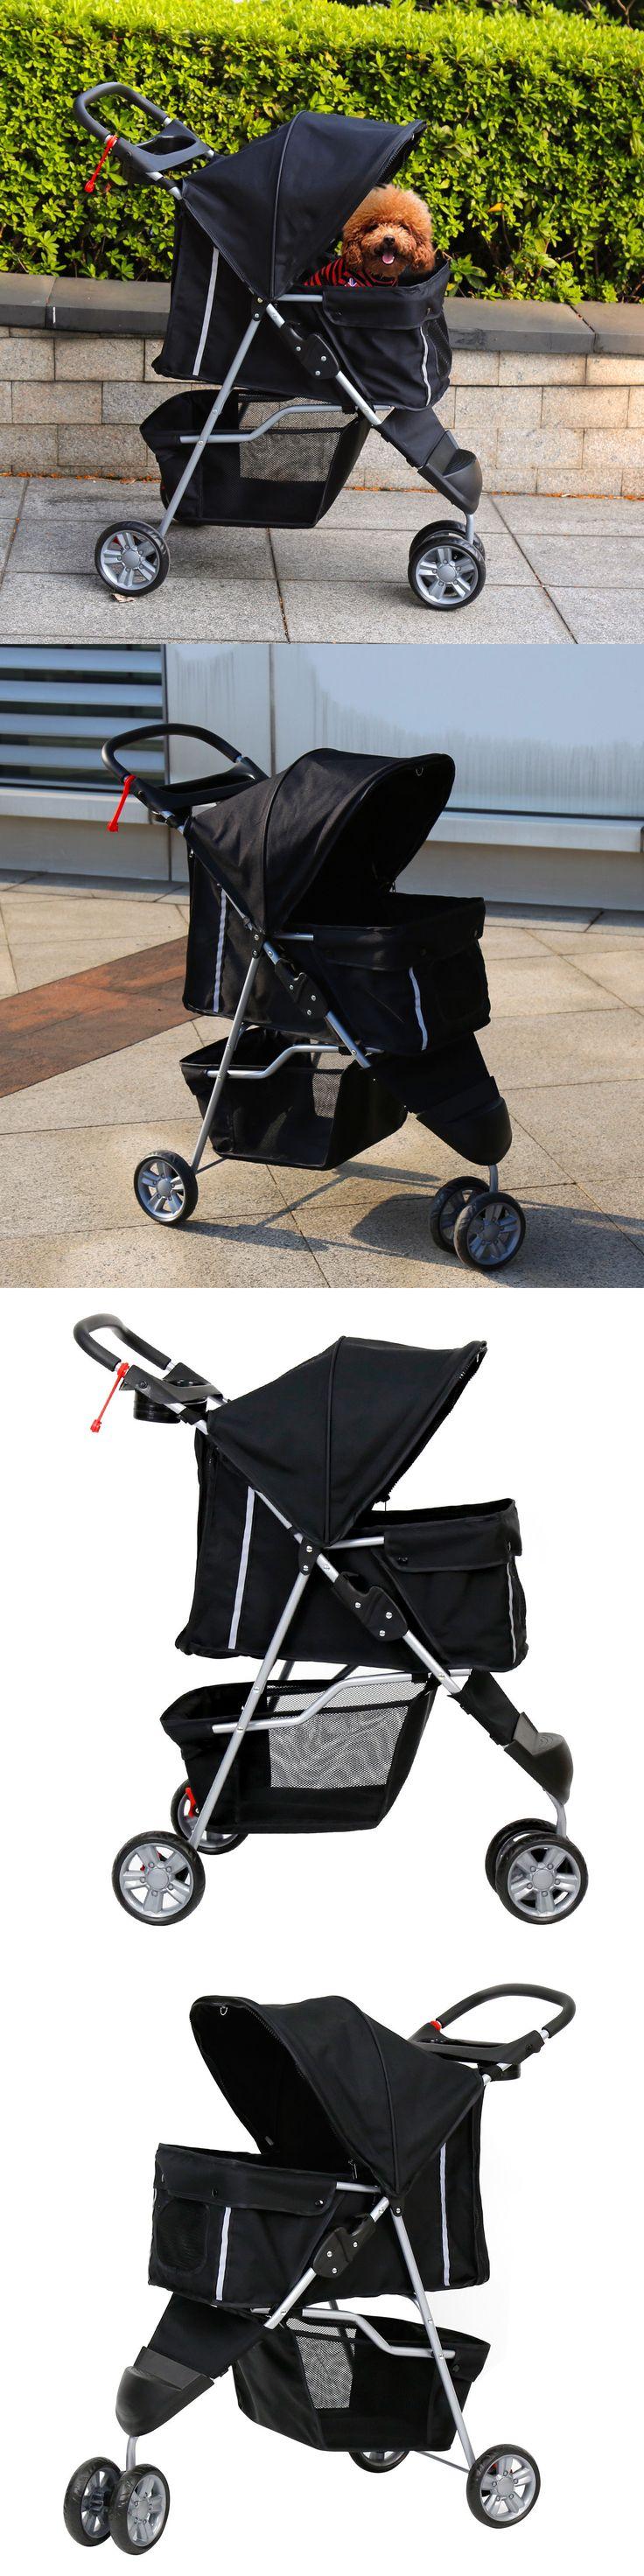 Carriers and Totes Kinbor Pet Stroller Cat Dog 3 Wheel Walk Jogger Travel Folding